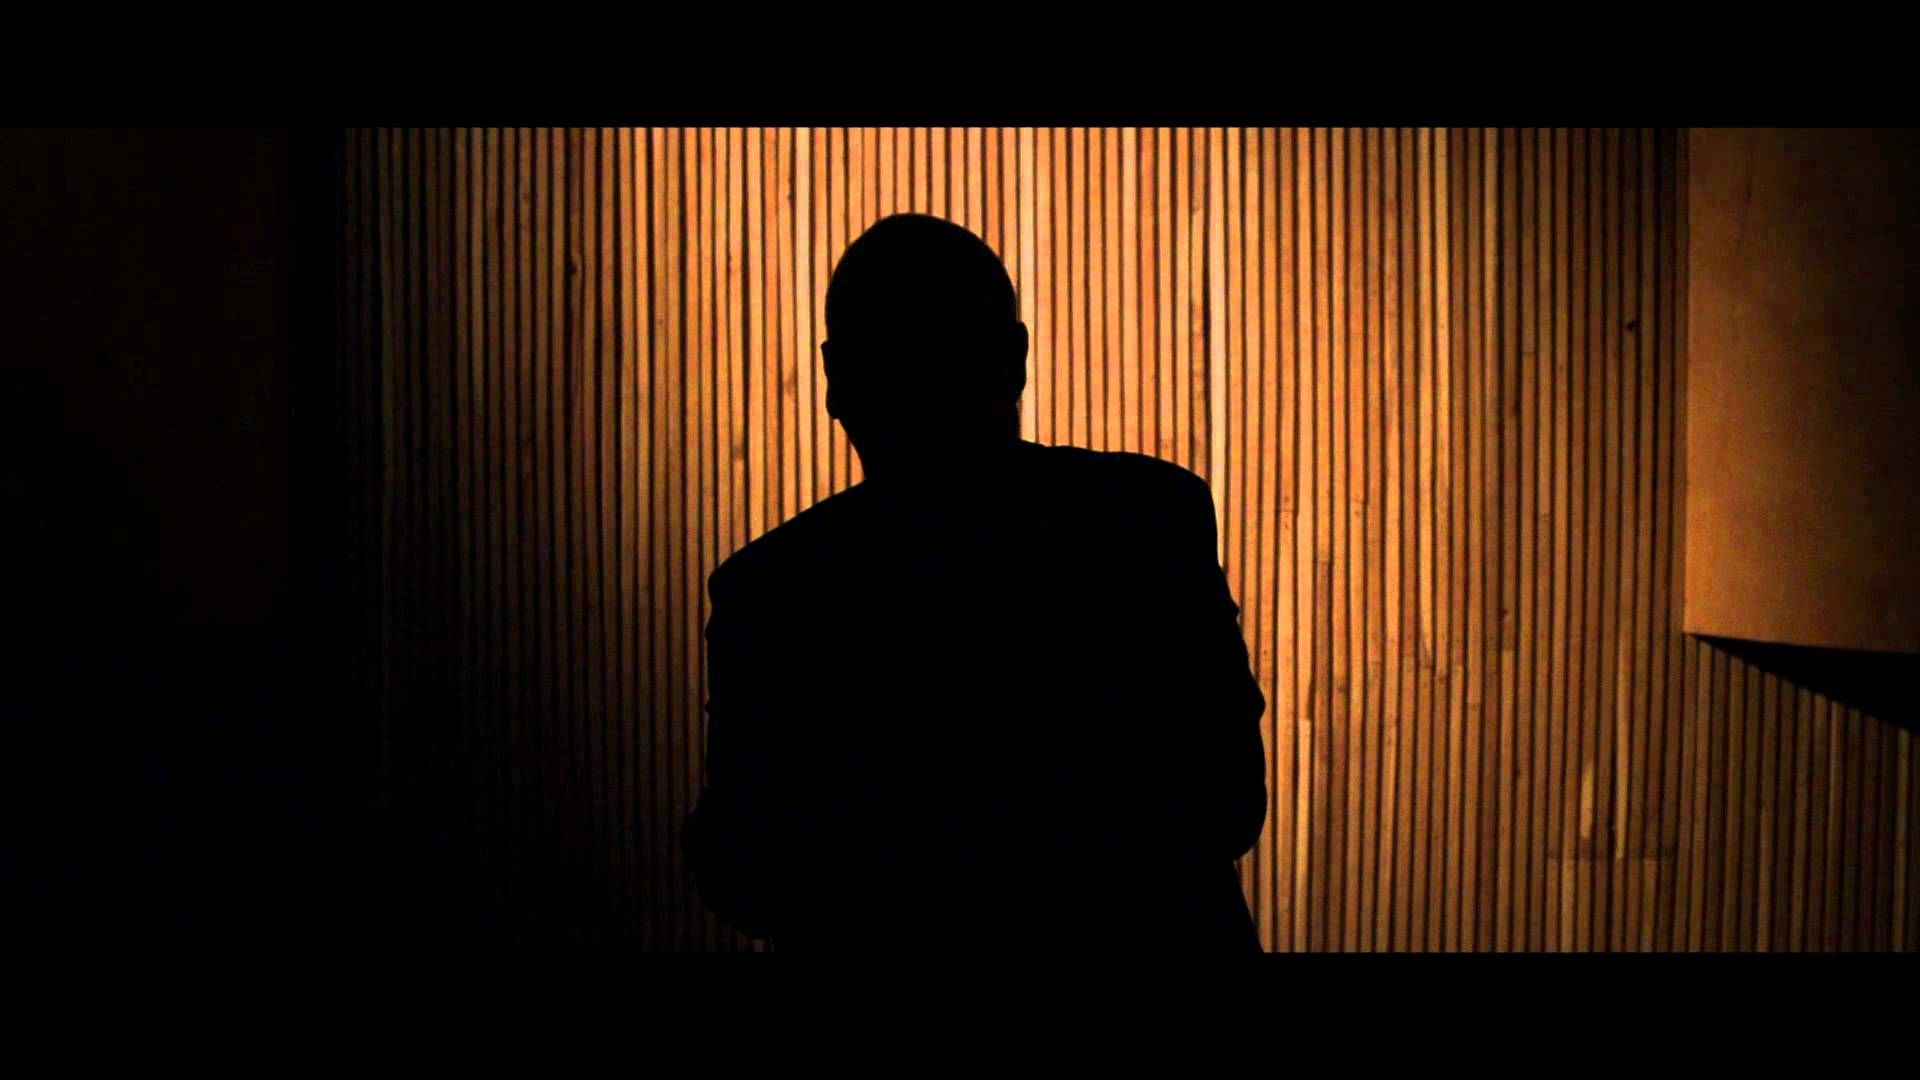 Stanislaw Soyka Wiem Ze Nie Wrocisz Official Music Video Polish Music Music Videos Human Silhouette